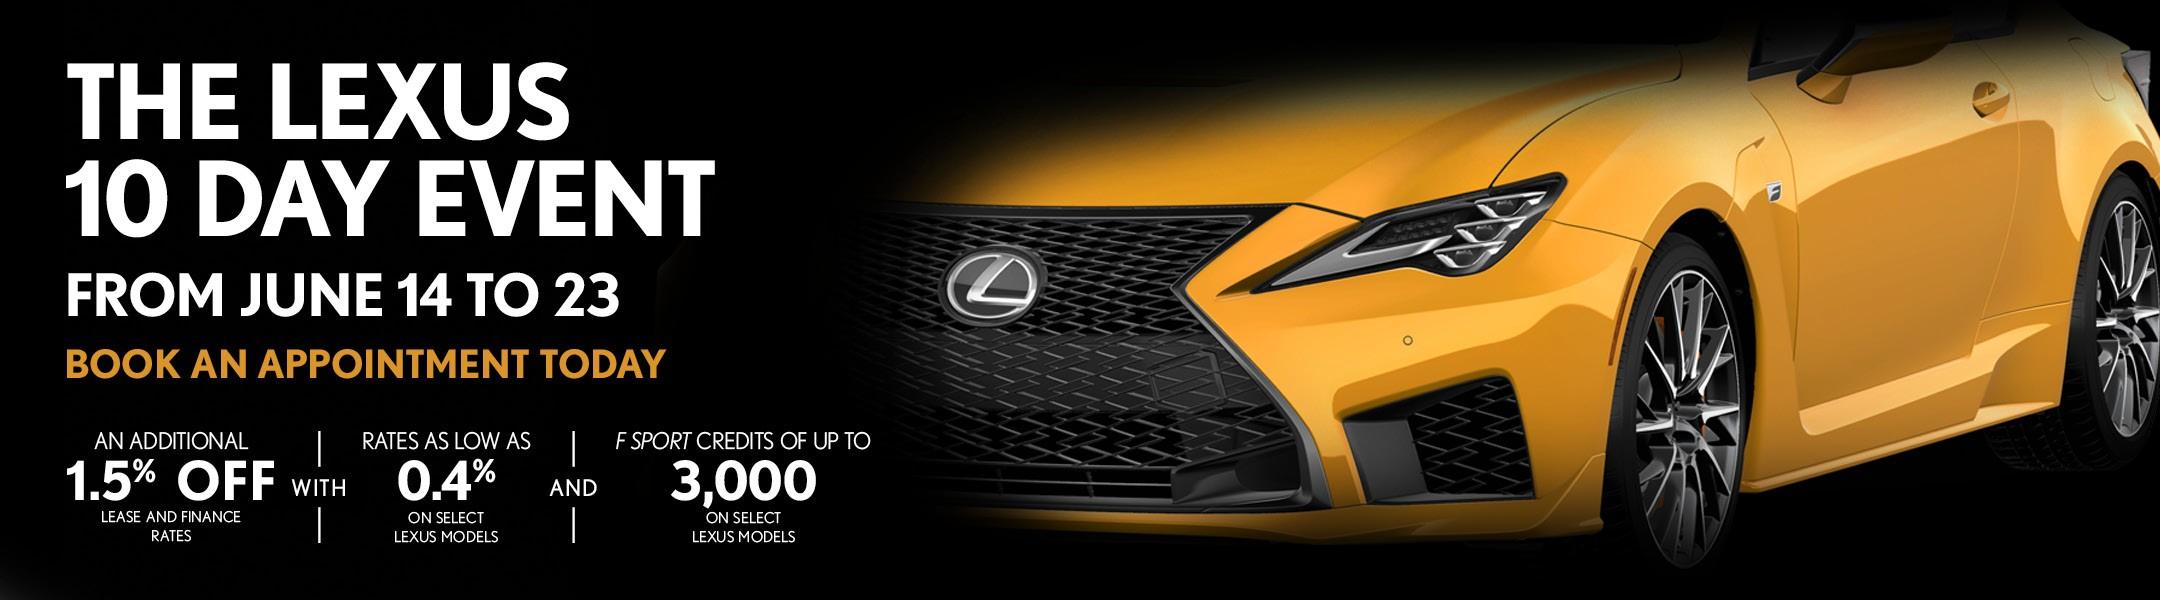 Lexus 10 day even promotion in Toronto, Ontario, GTA, Etobicoke, York, at Ken Shaw Lexus sale